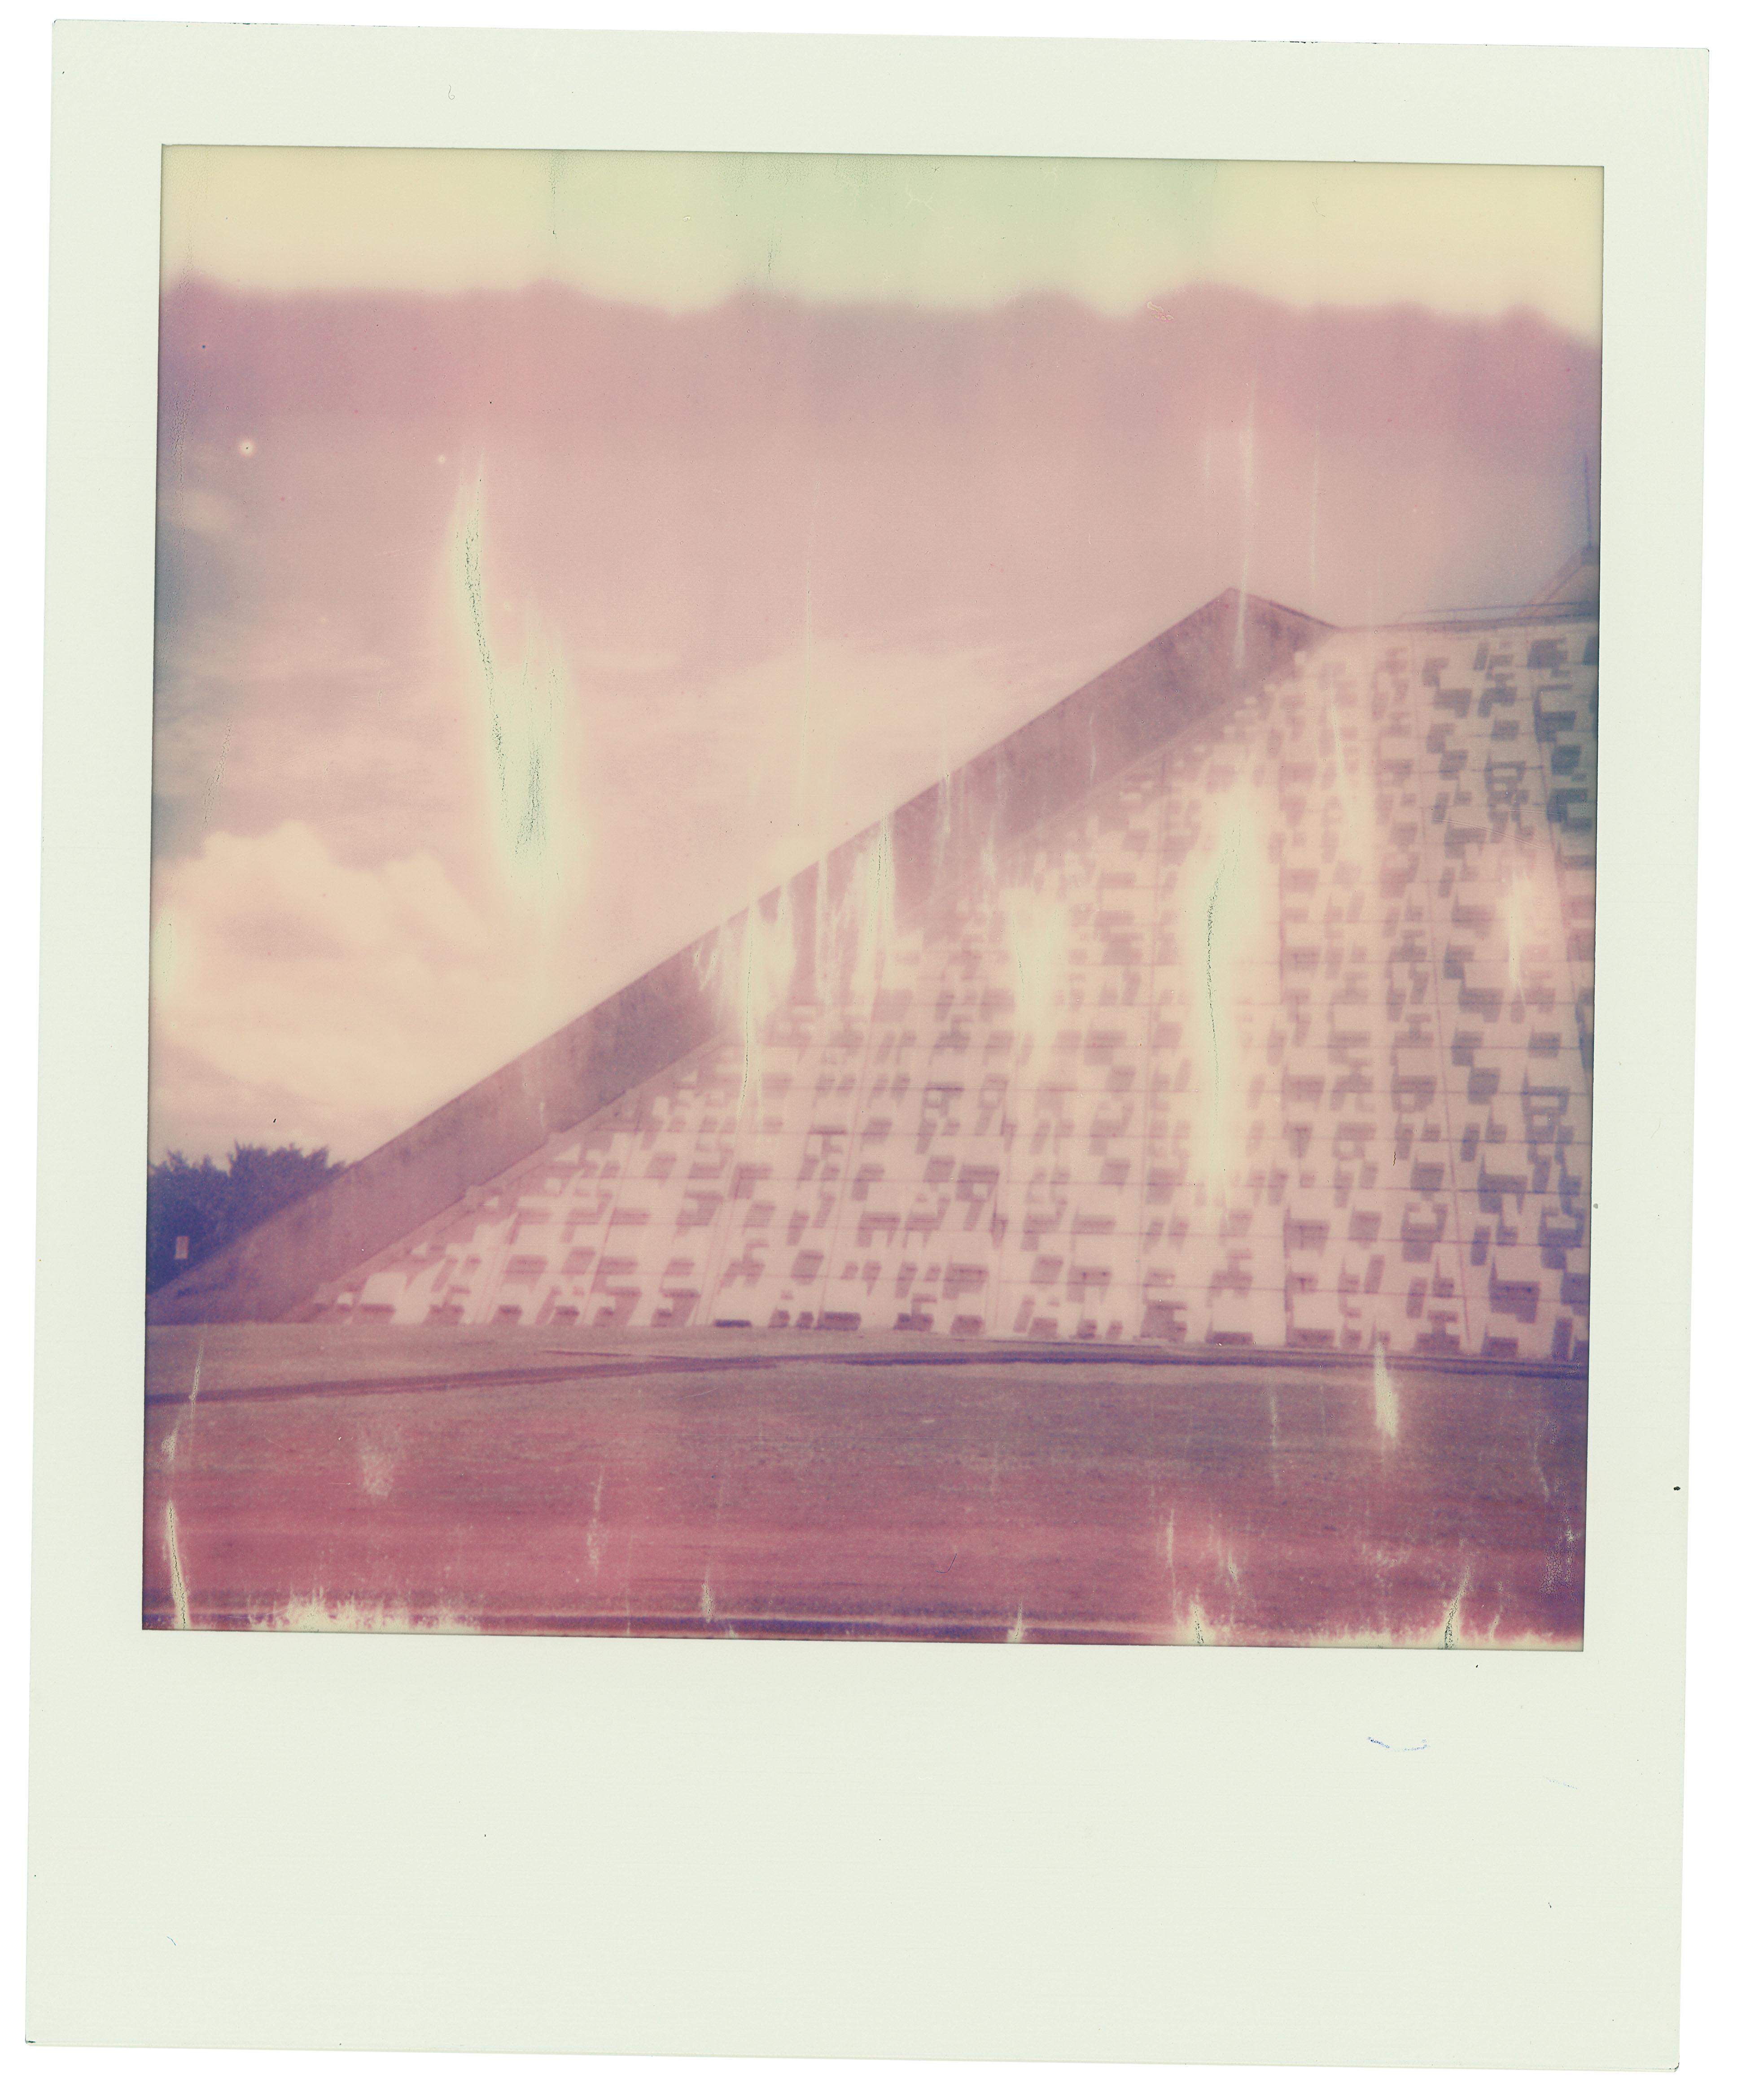 Isolda Macedo (Brasília, DF) – I'M Polaroid (2021)